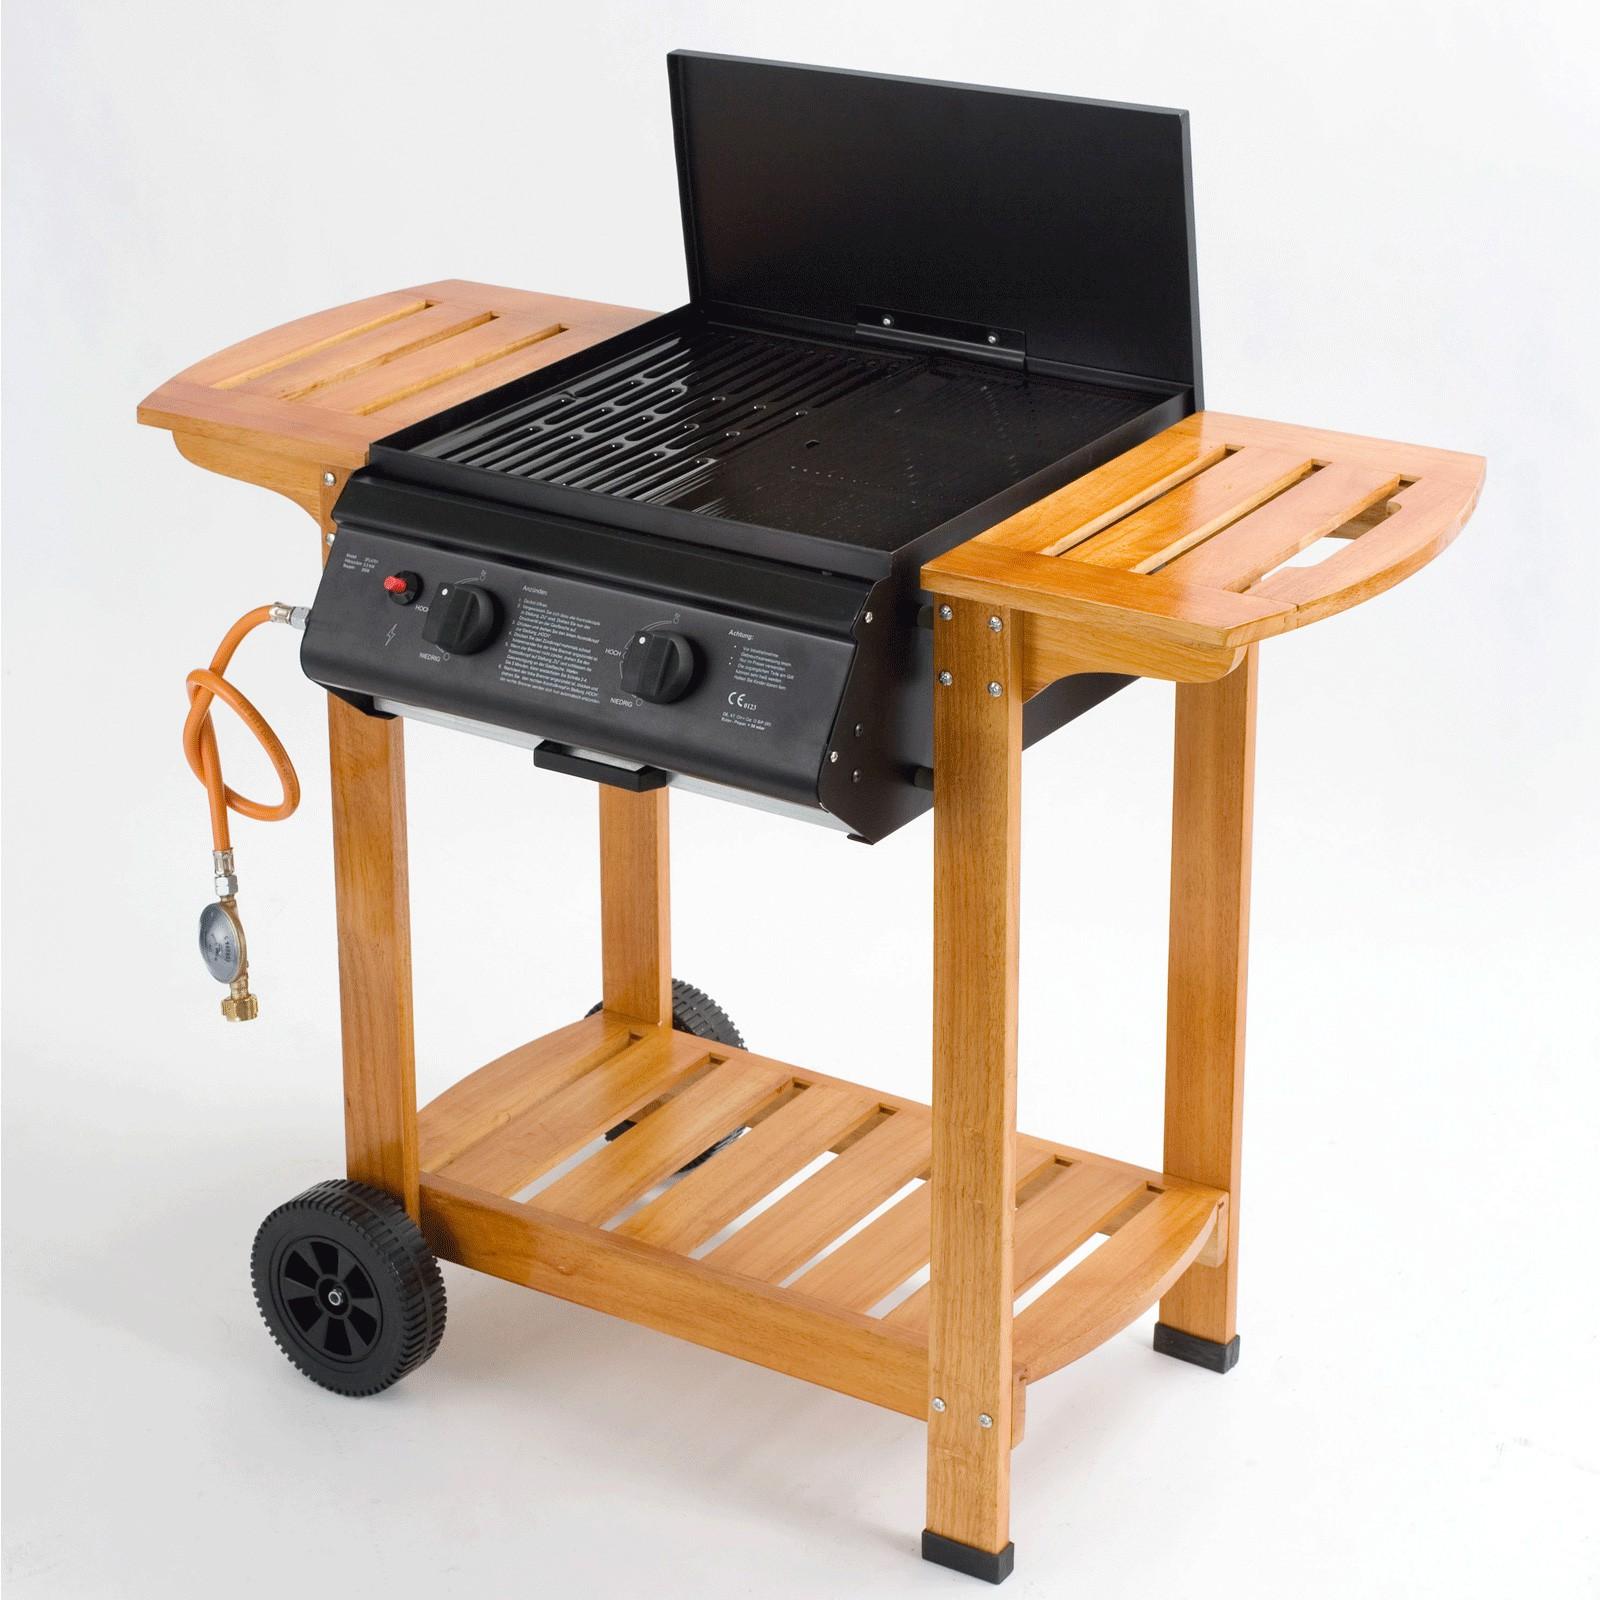 tepro gasgrill pittsburgh grillwagen mit holzgestell. Black Bedroom Furniture Sets. Home Design Ideas